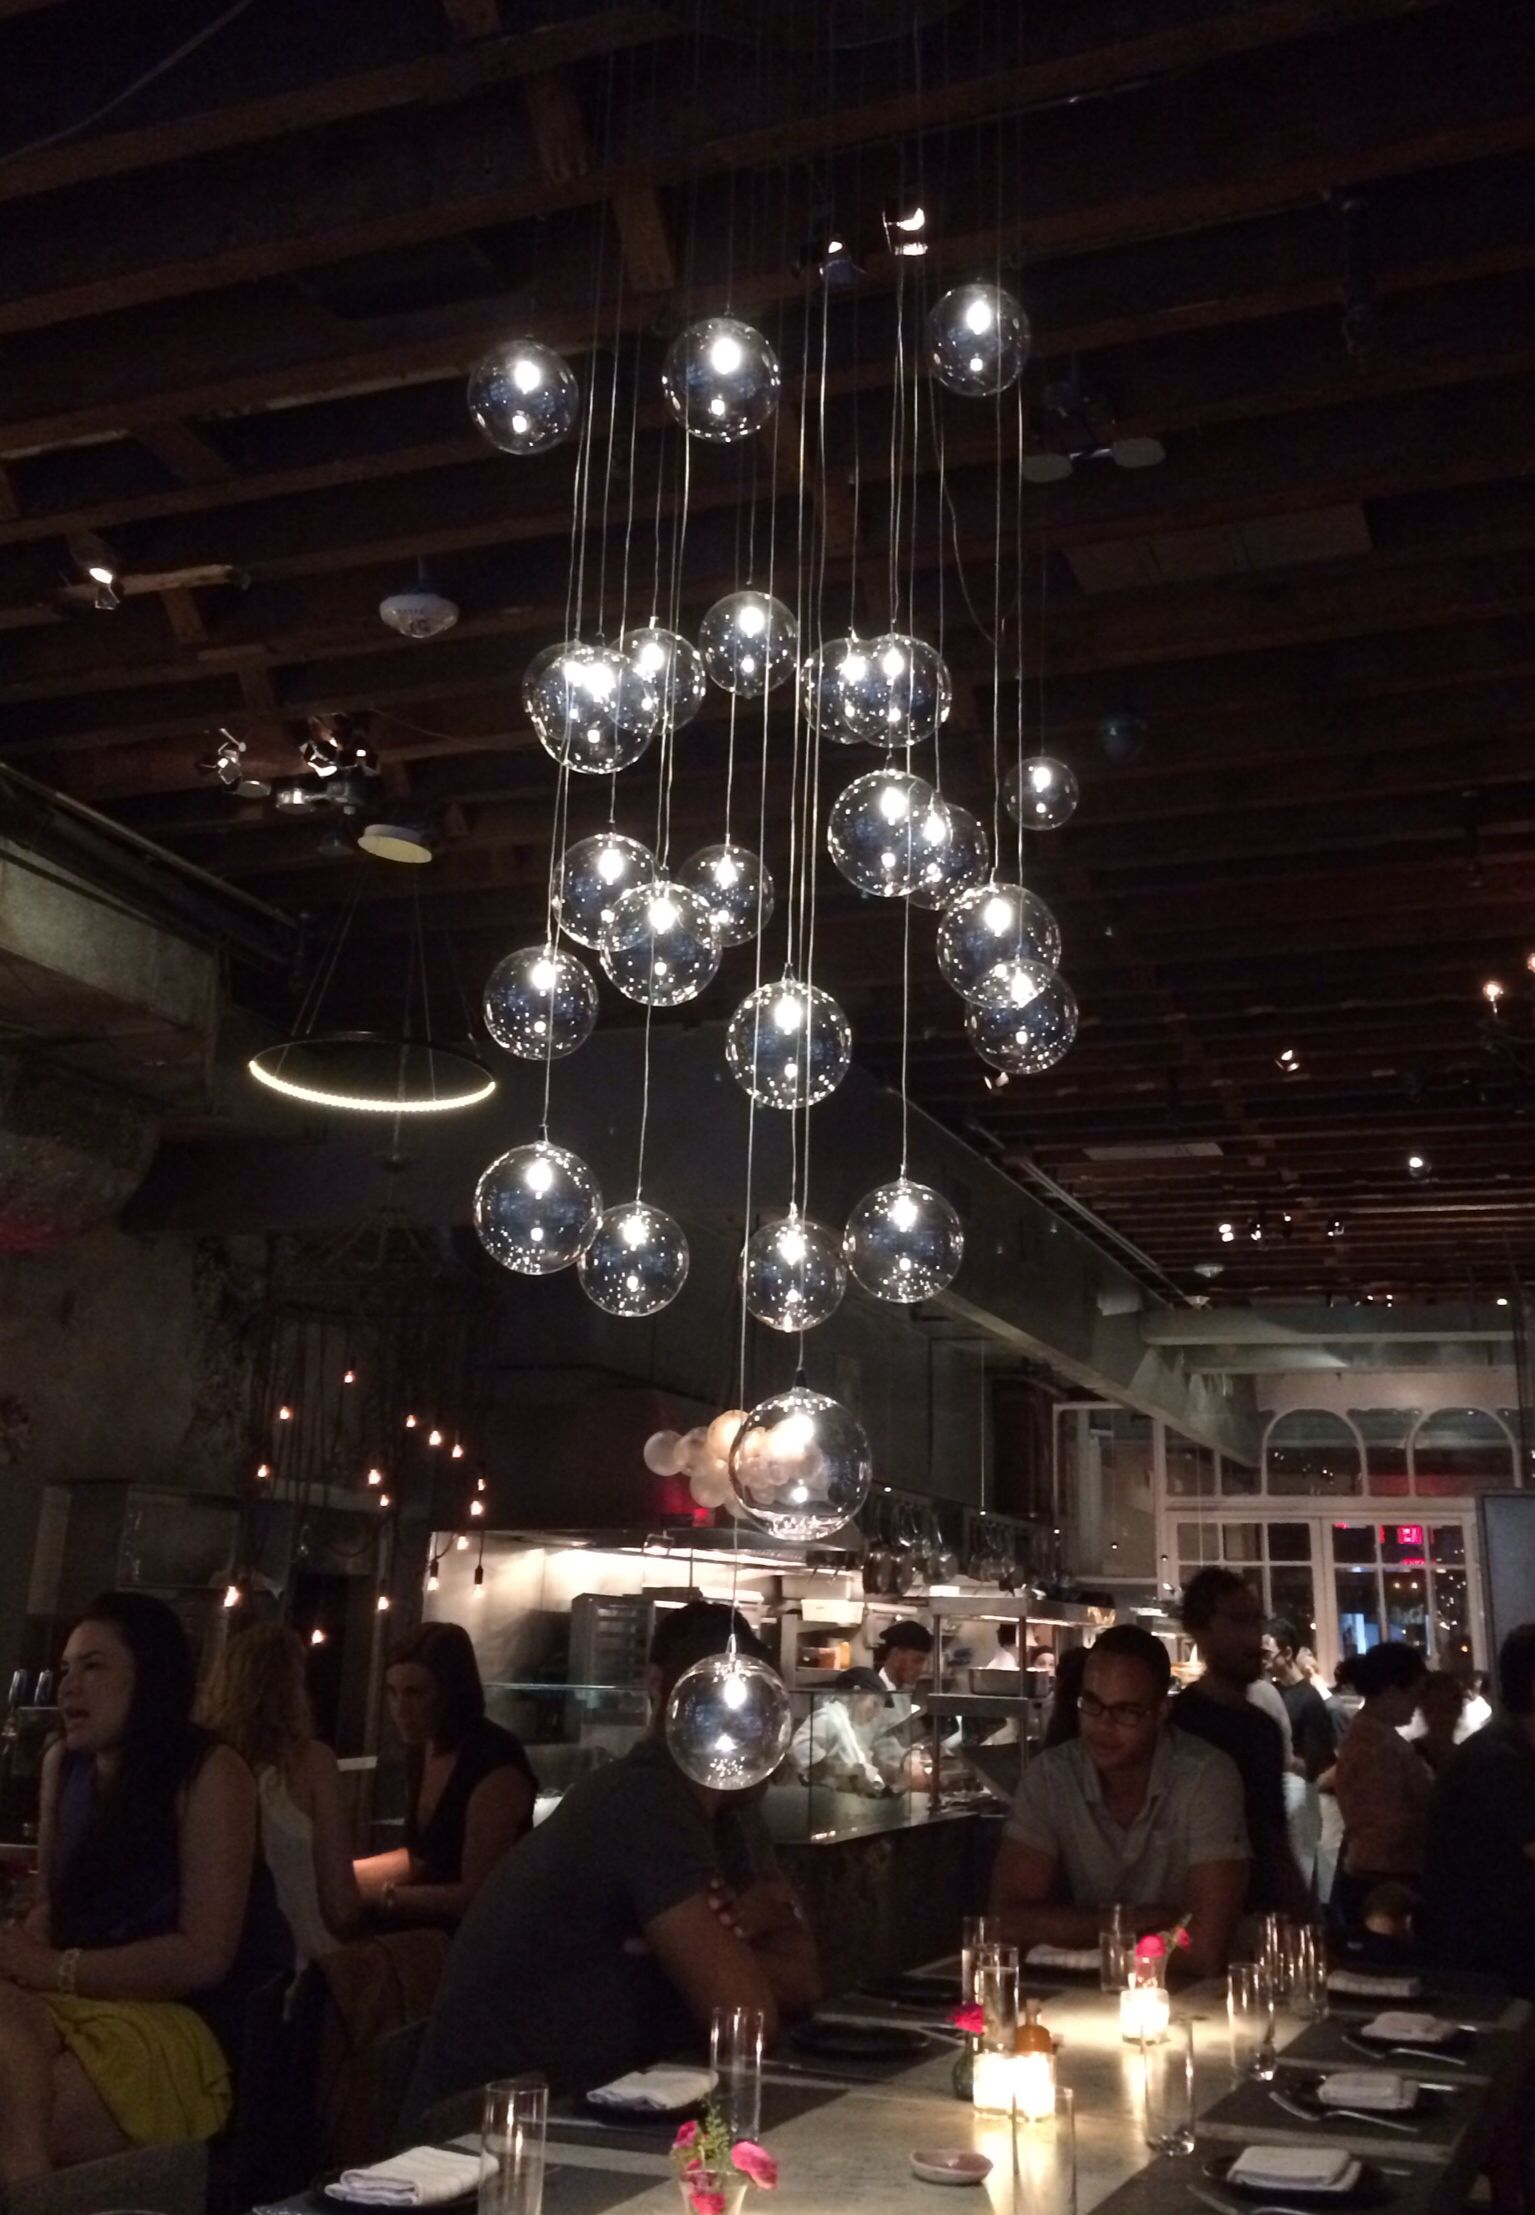 Restaurant Abc Cucina 35 E18th Street Nyc Ceiling